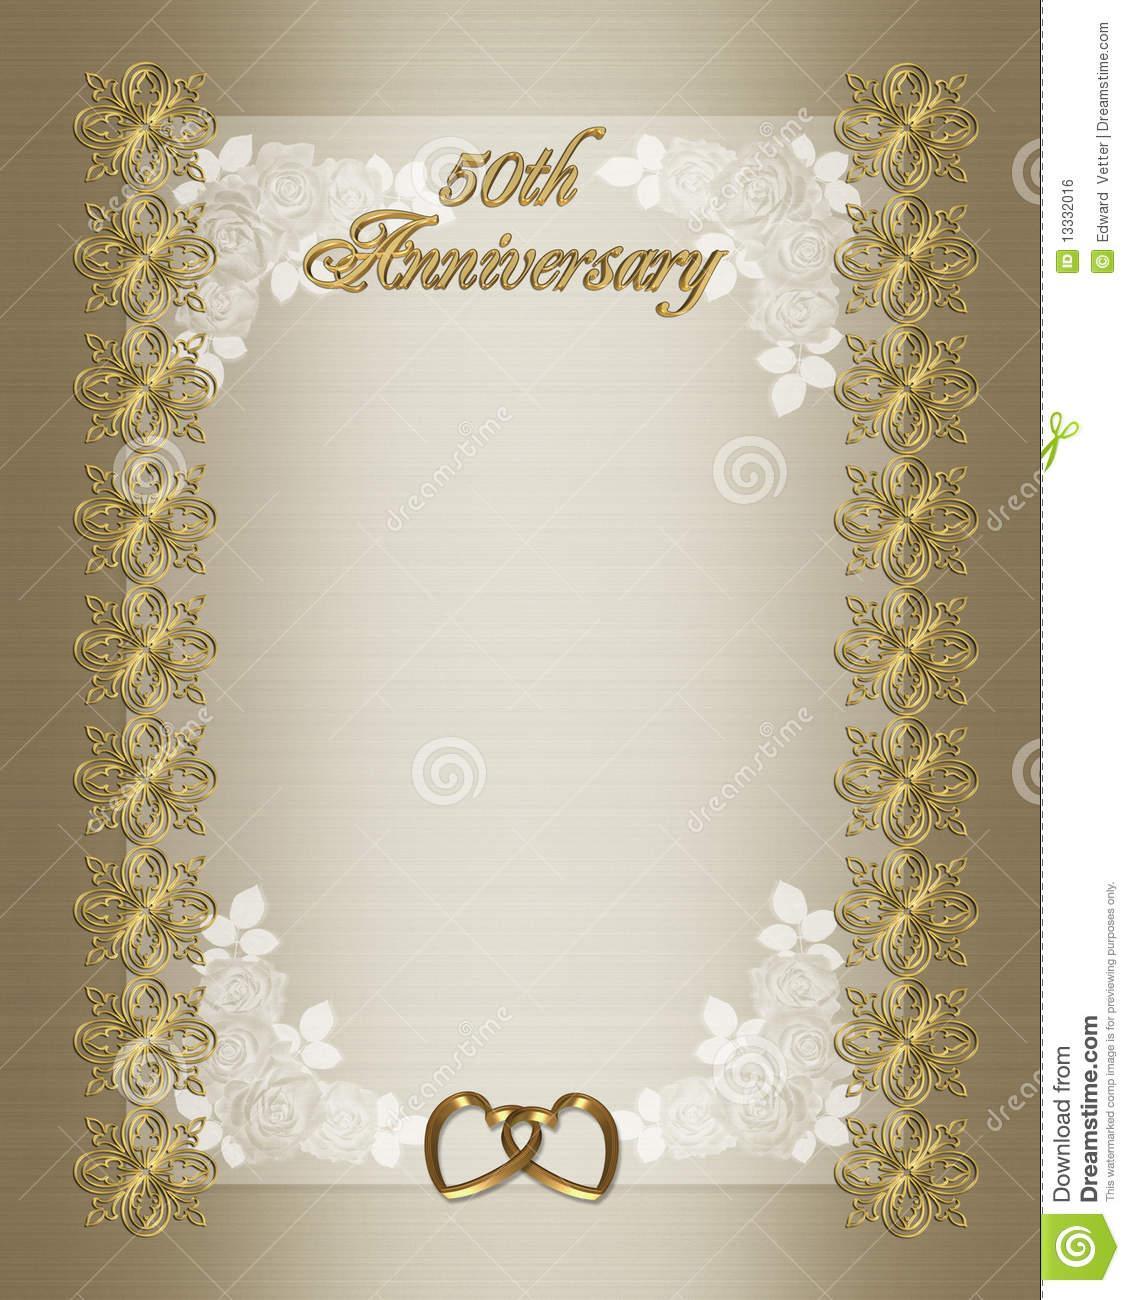 50th Wedding Anniversary Templates Free Download